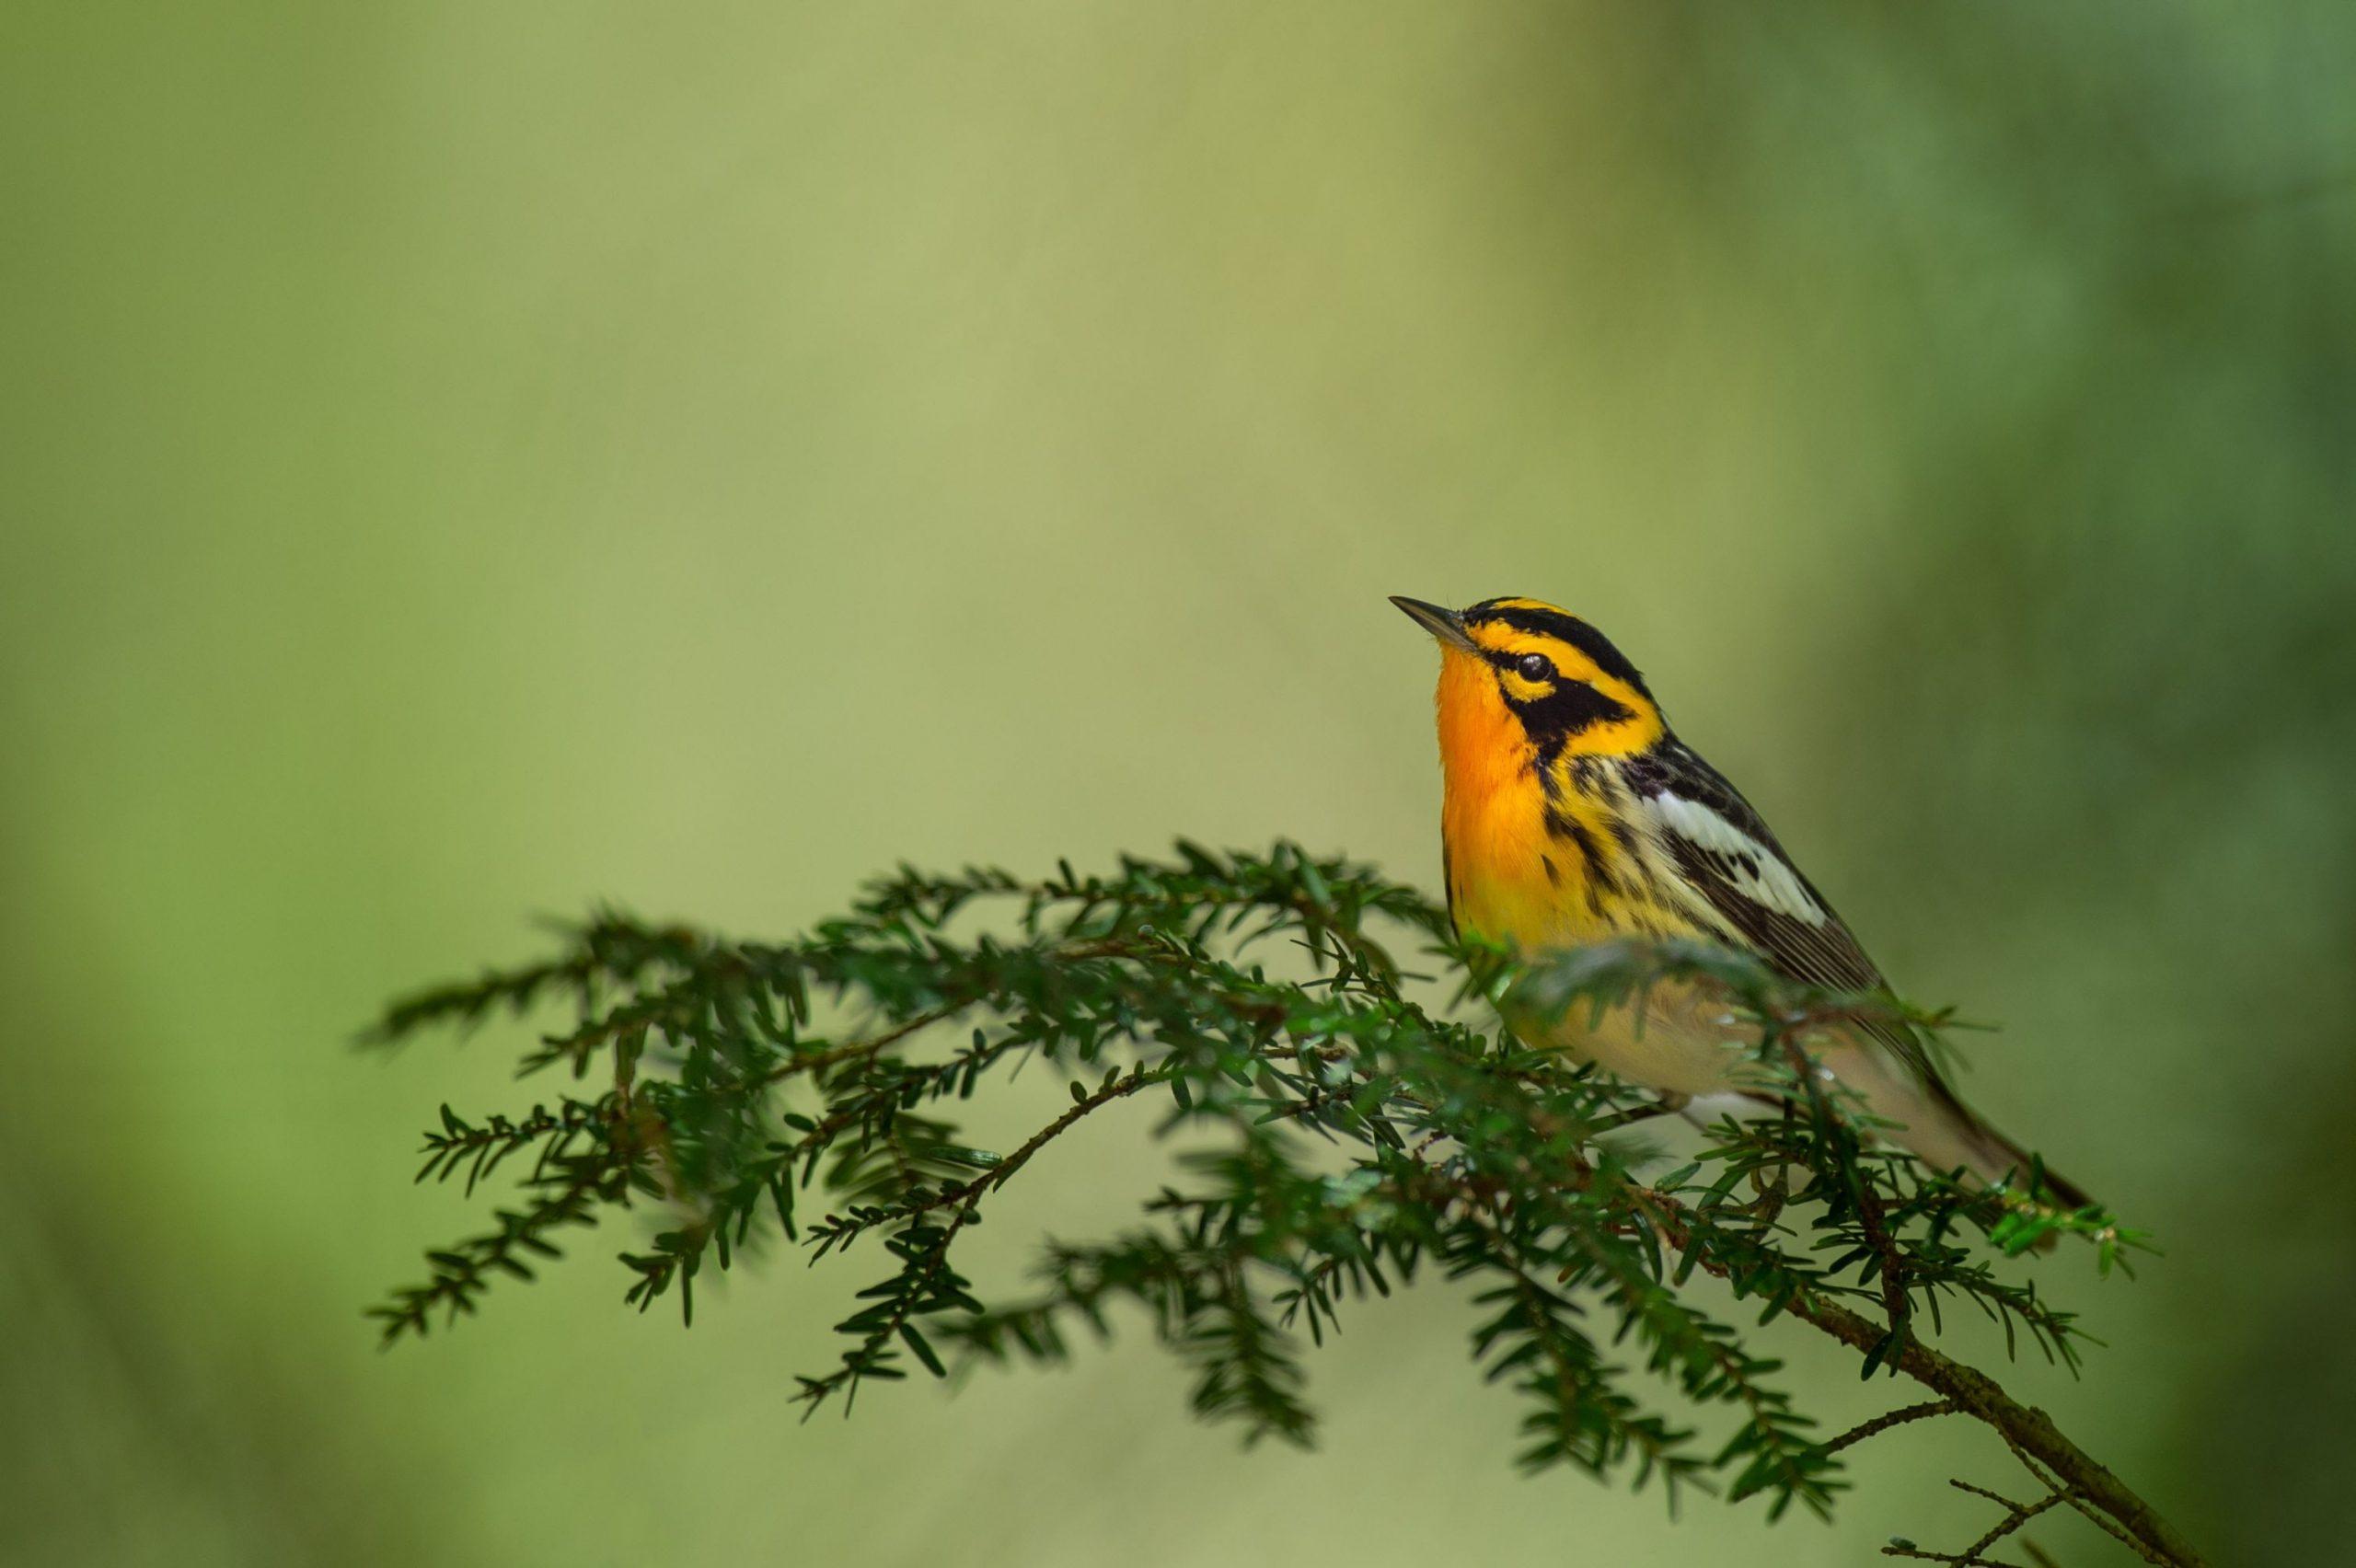 close up of an orange Warbler bird on a branch